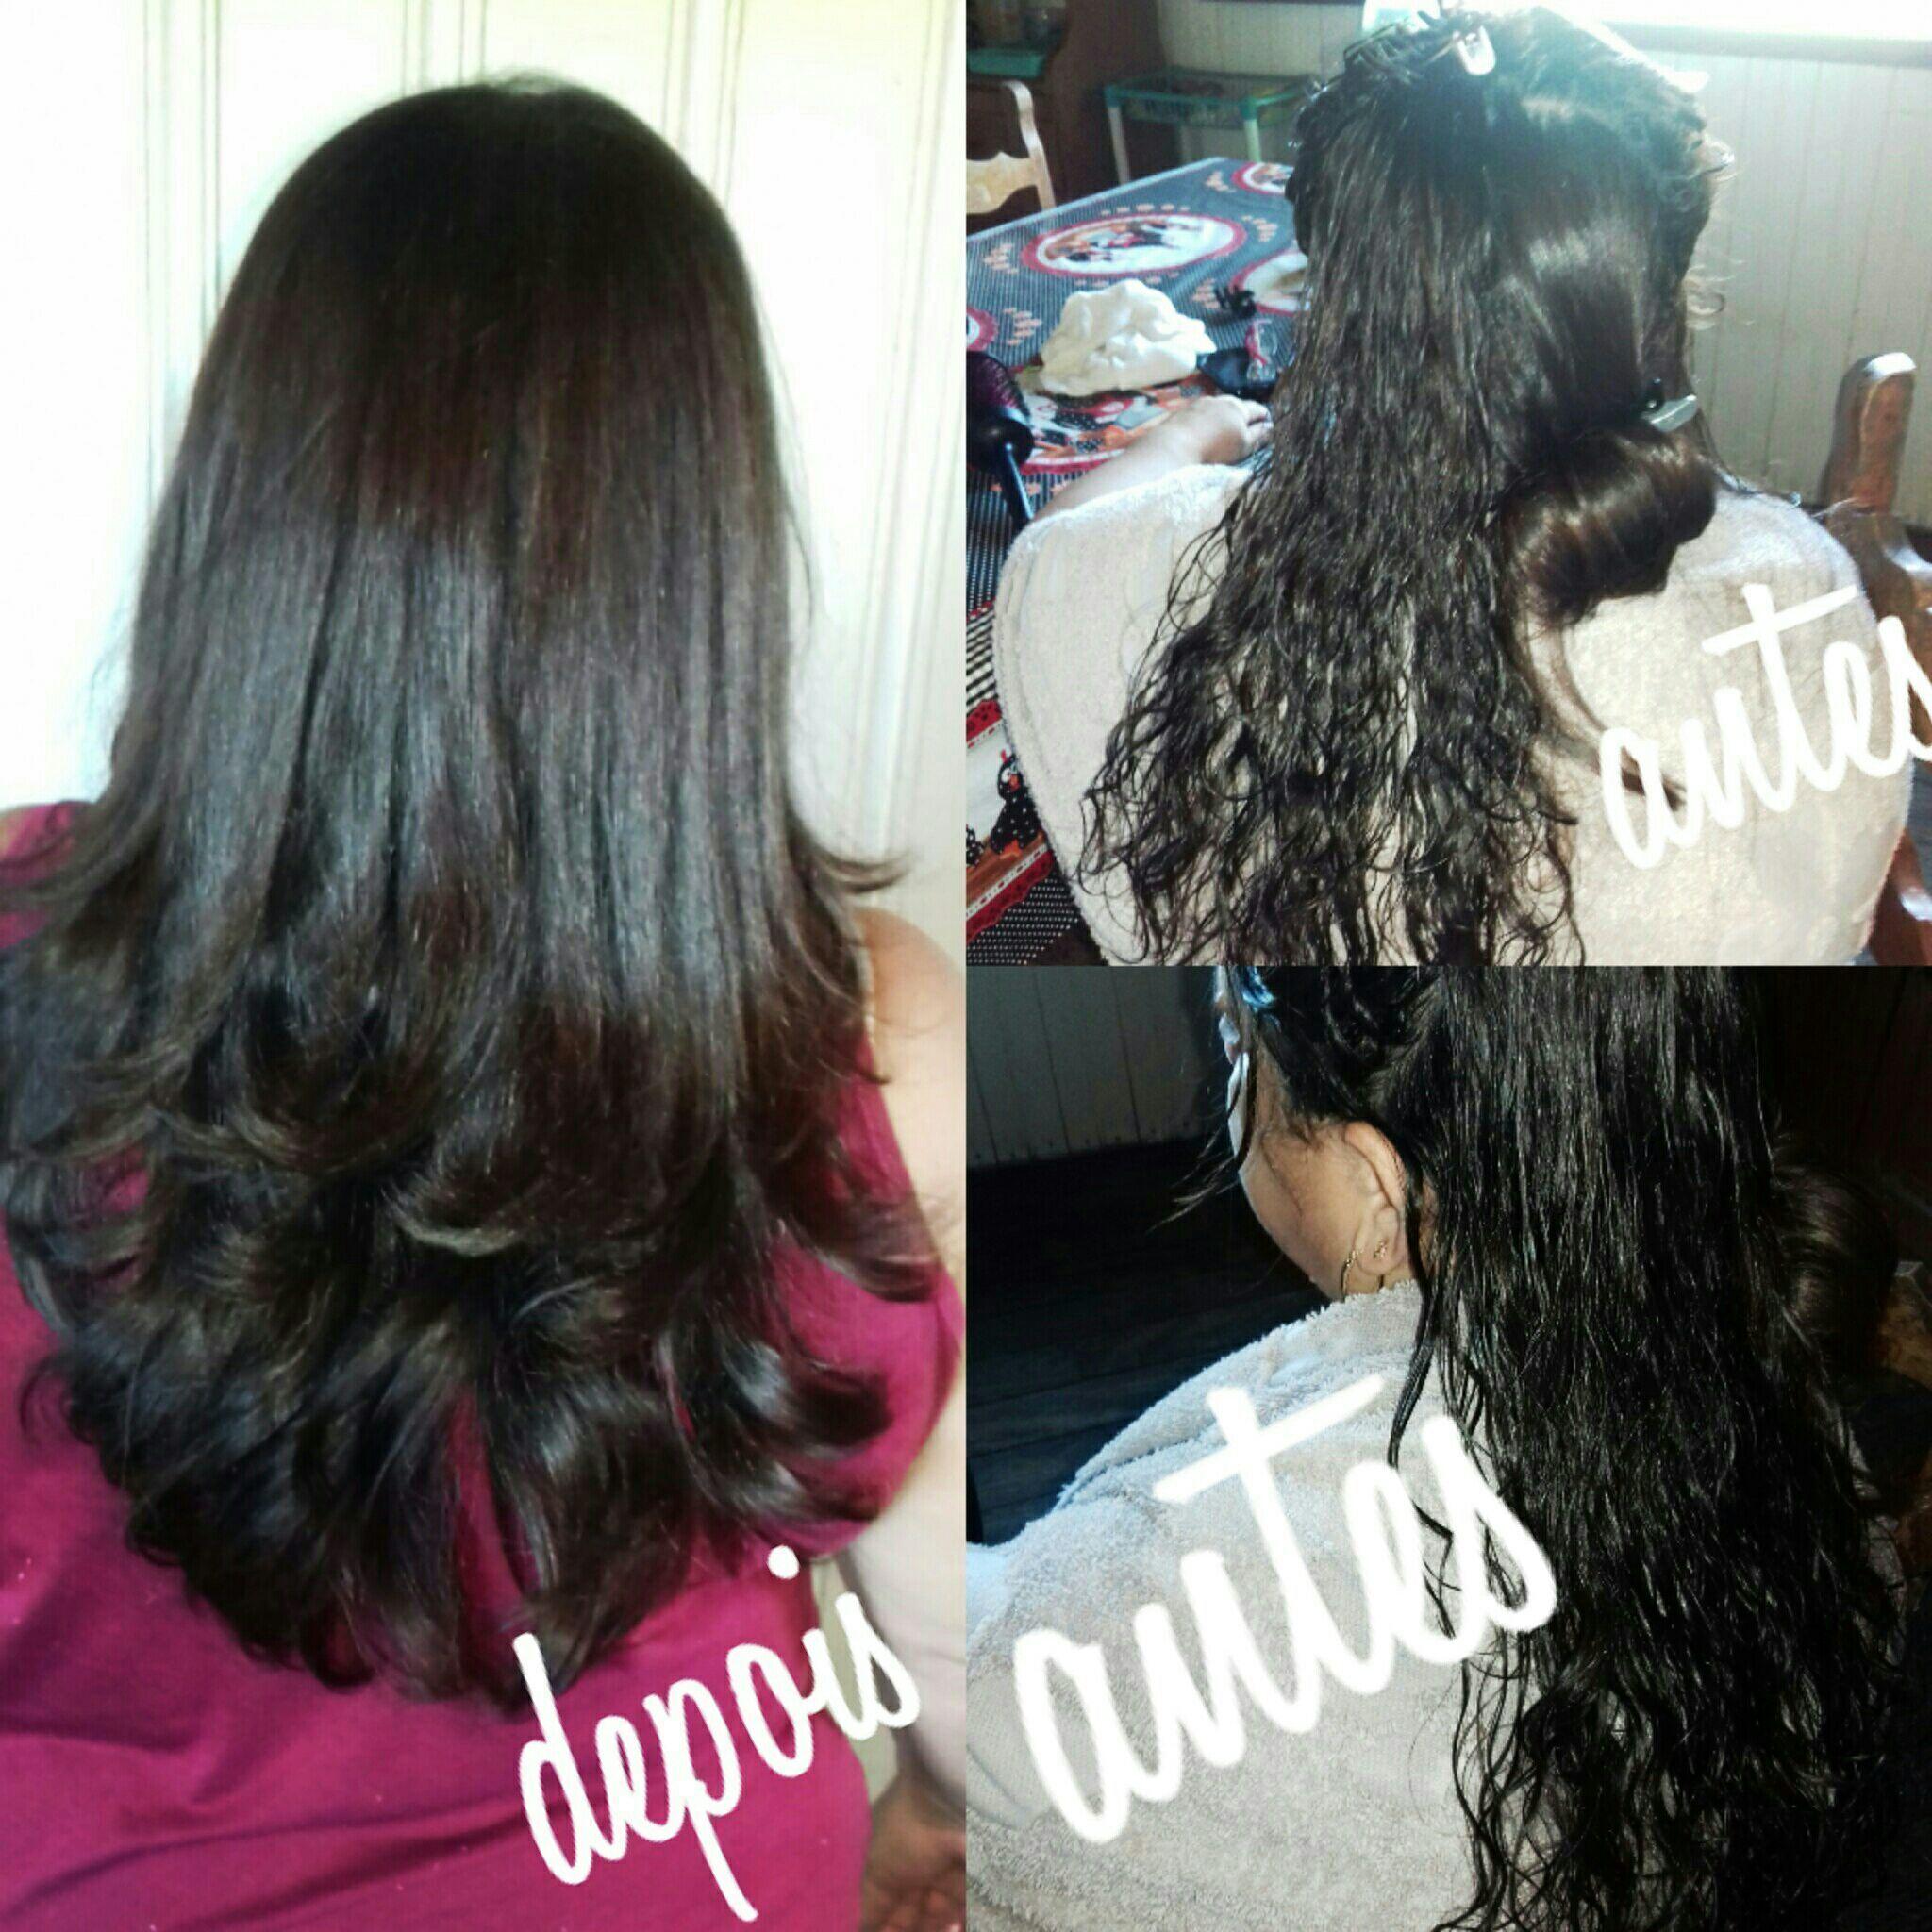 cabeleireiro(a) escovista escovista escovista cabeleireiro(a) assistente esteticista barbeiro(a)